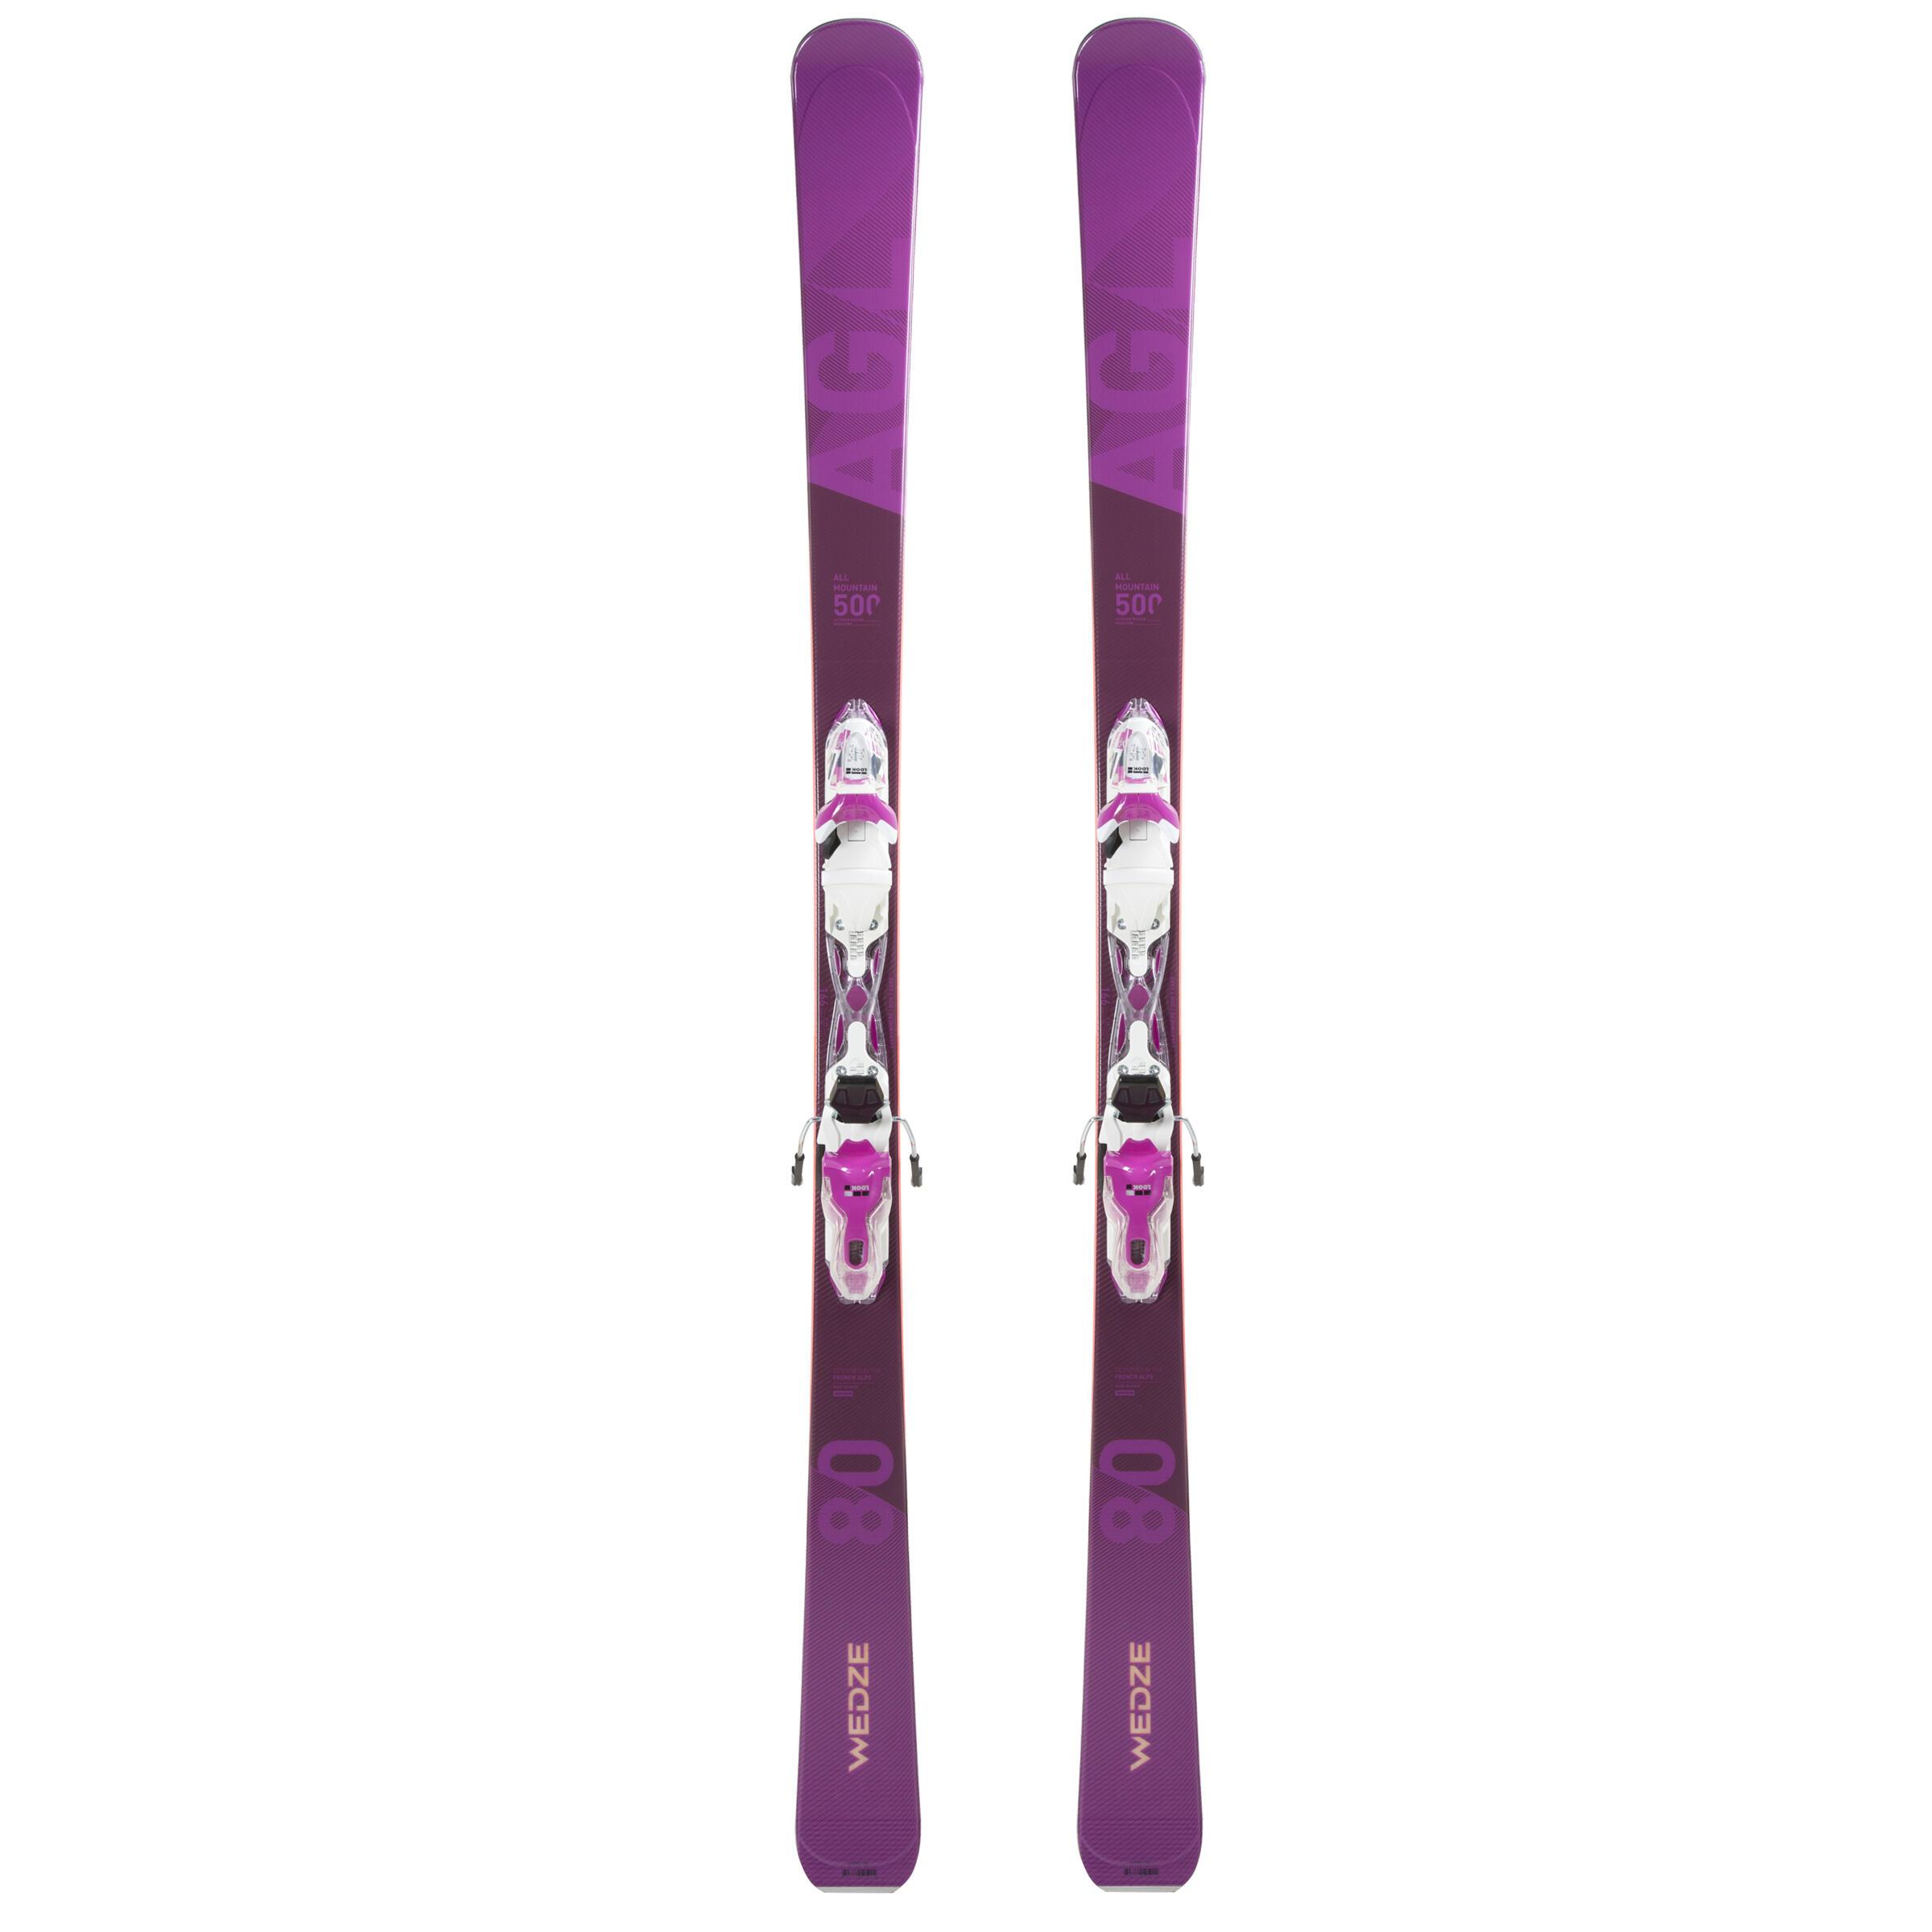 b8af7180214b27 Ski | Skimaterial | günstig online kaufen | WED´ZE | DECATHLON